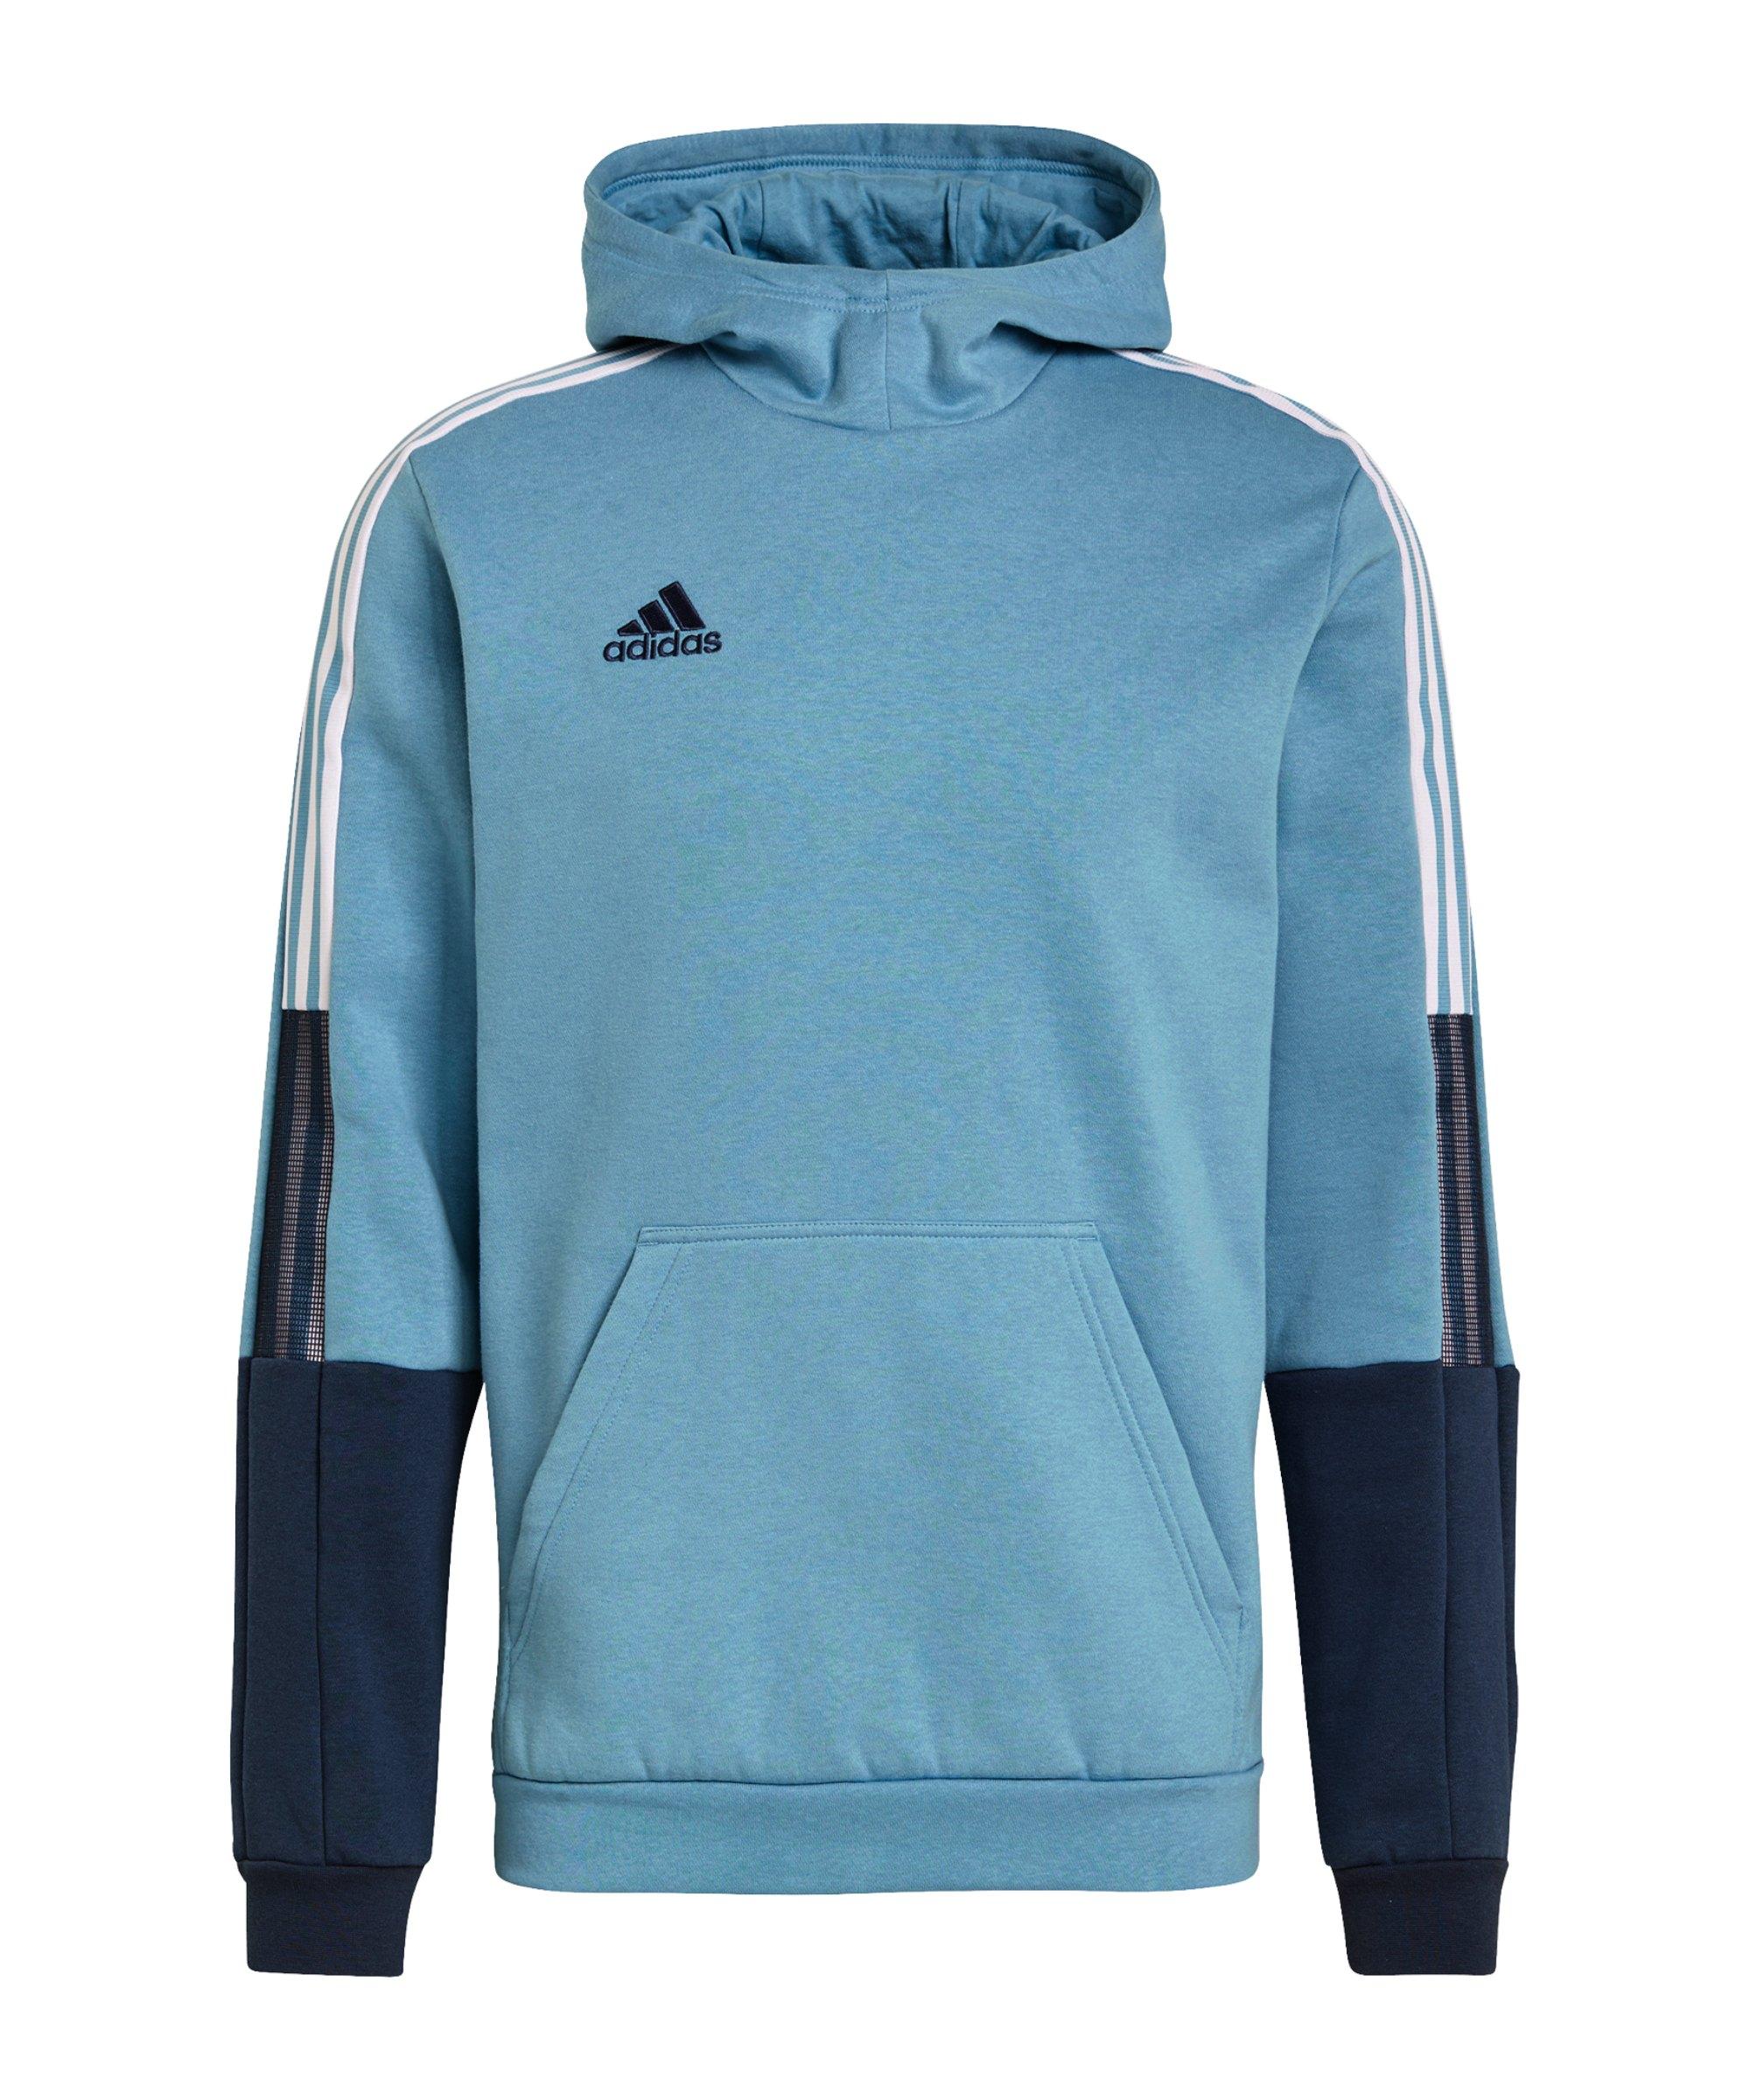 adidas Tiro Hoody Blau Weiss - blau